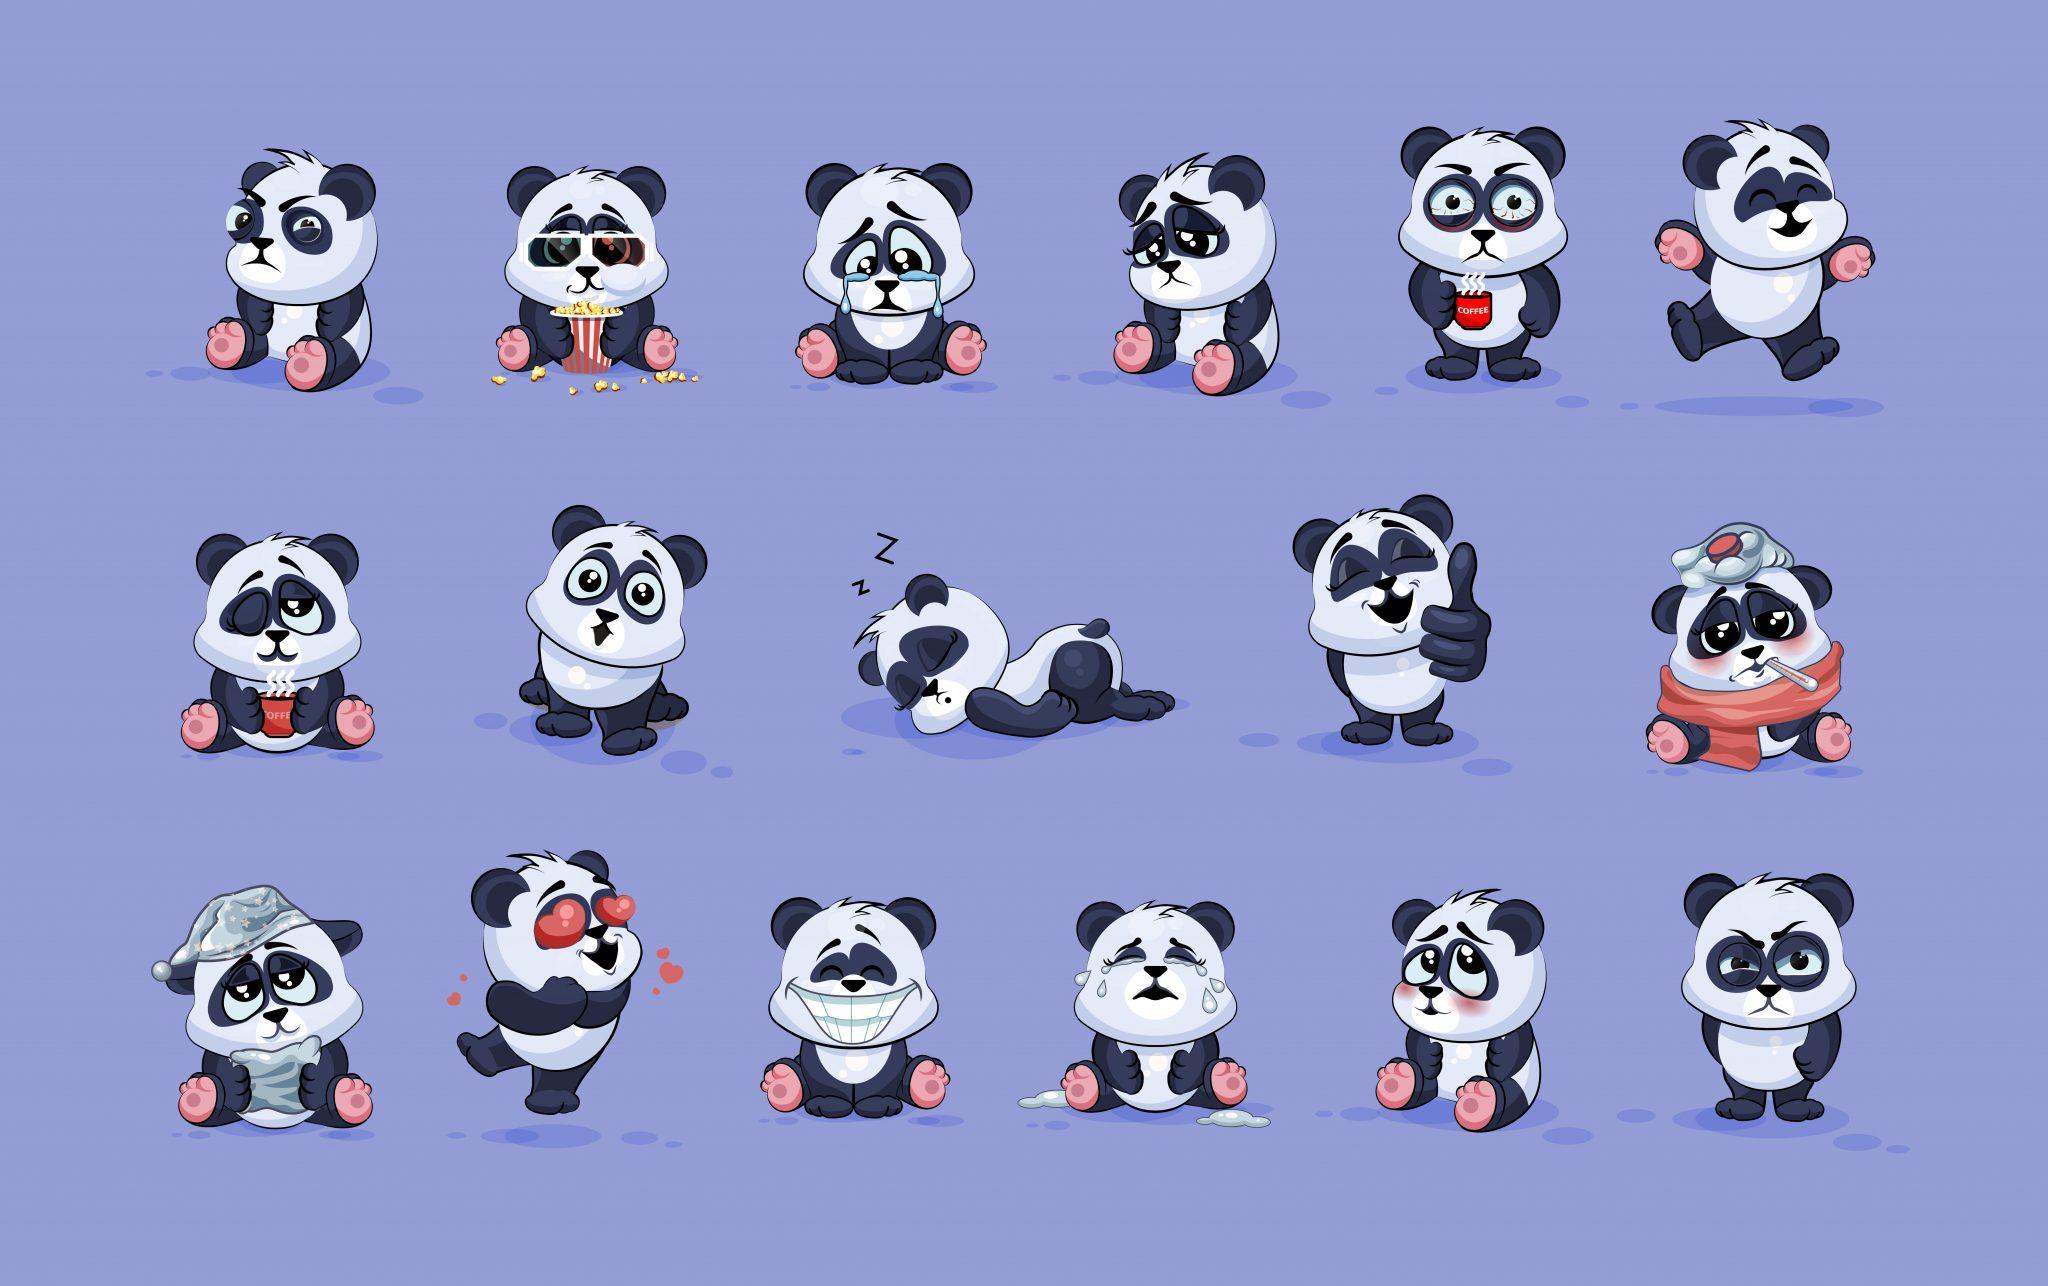 pandabeertjes